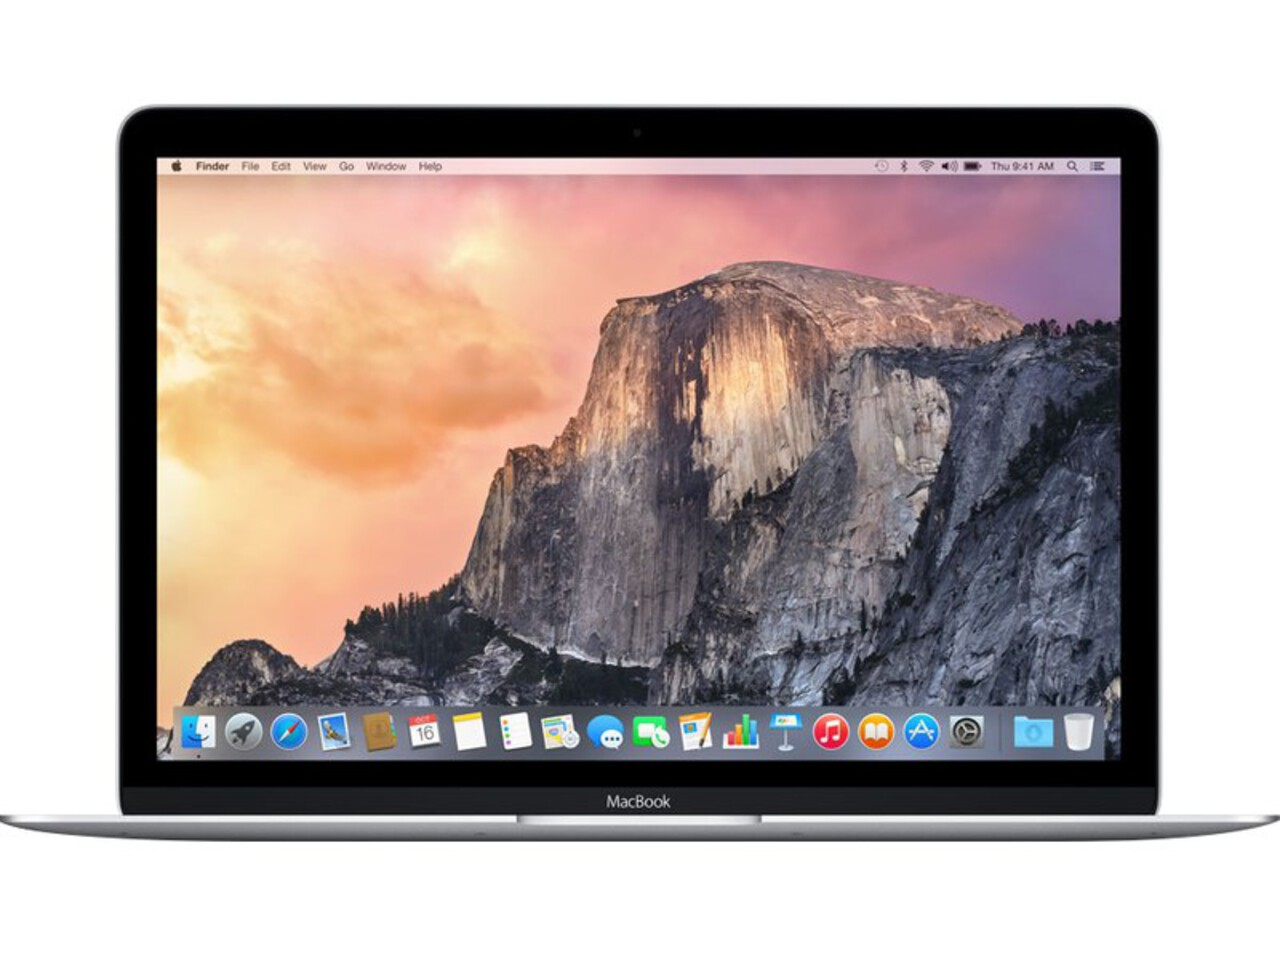 macbook 12 inch 2015 silver